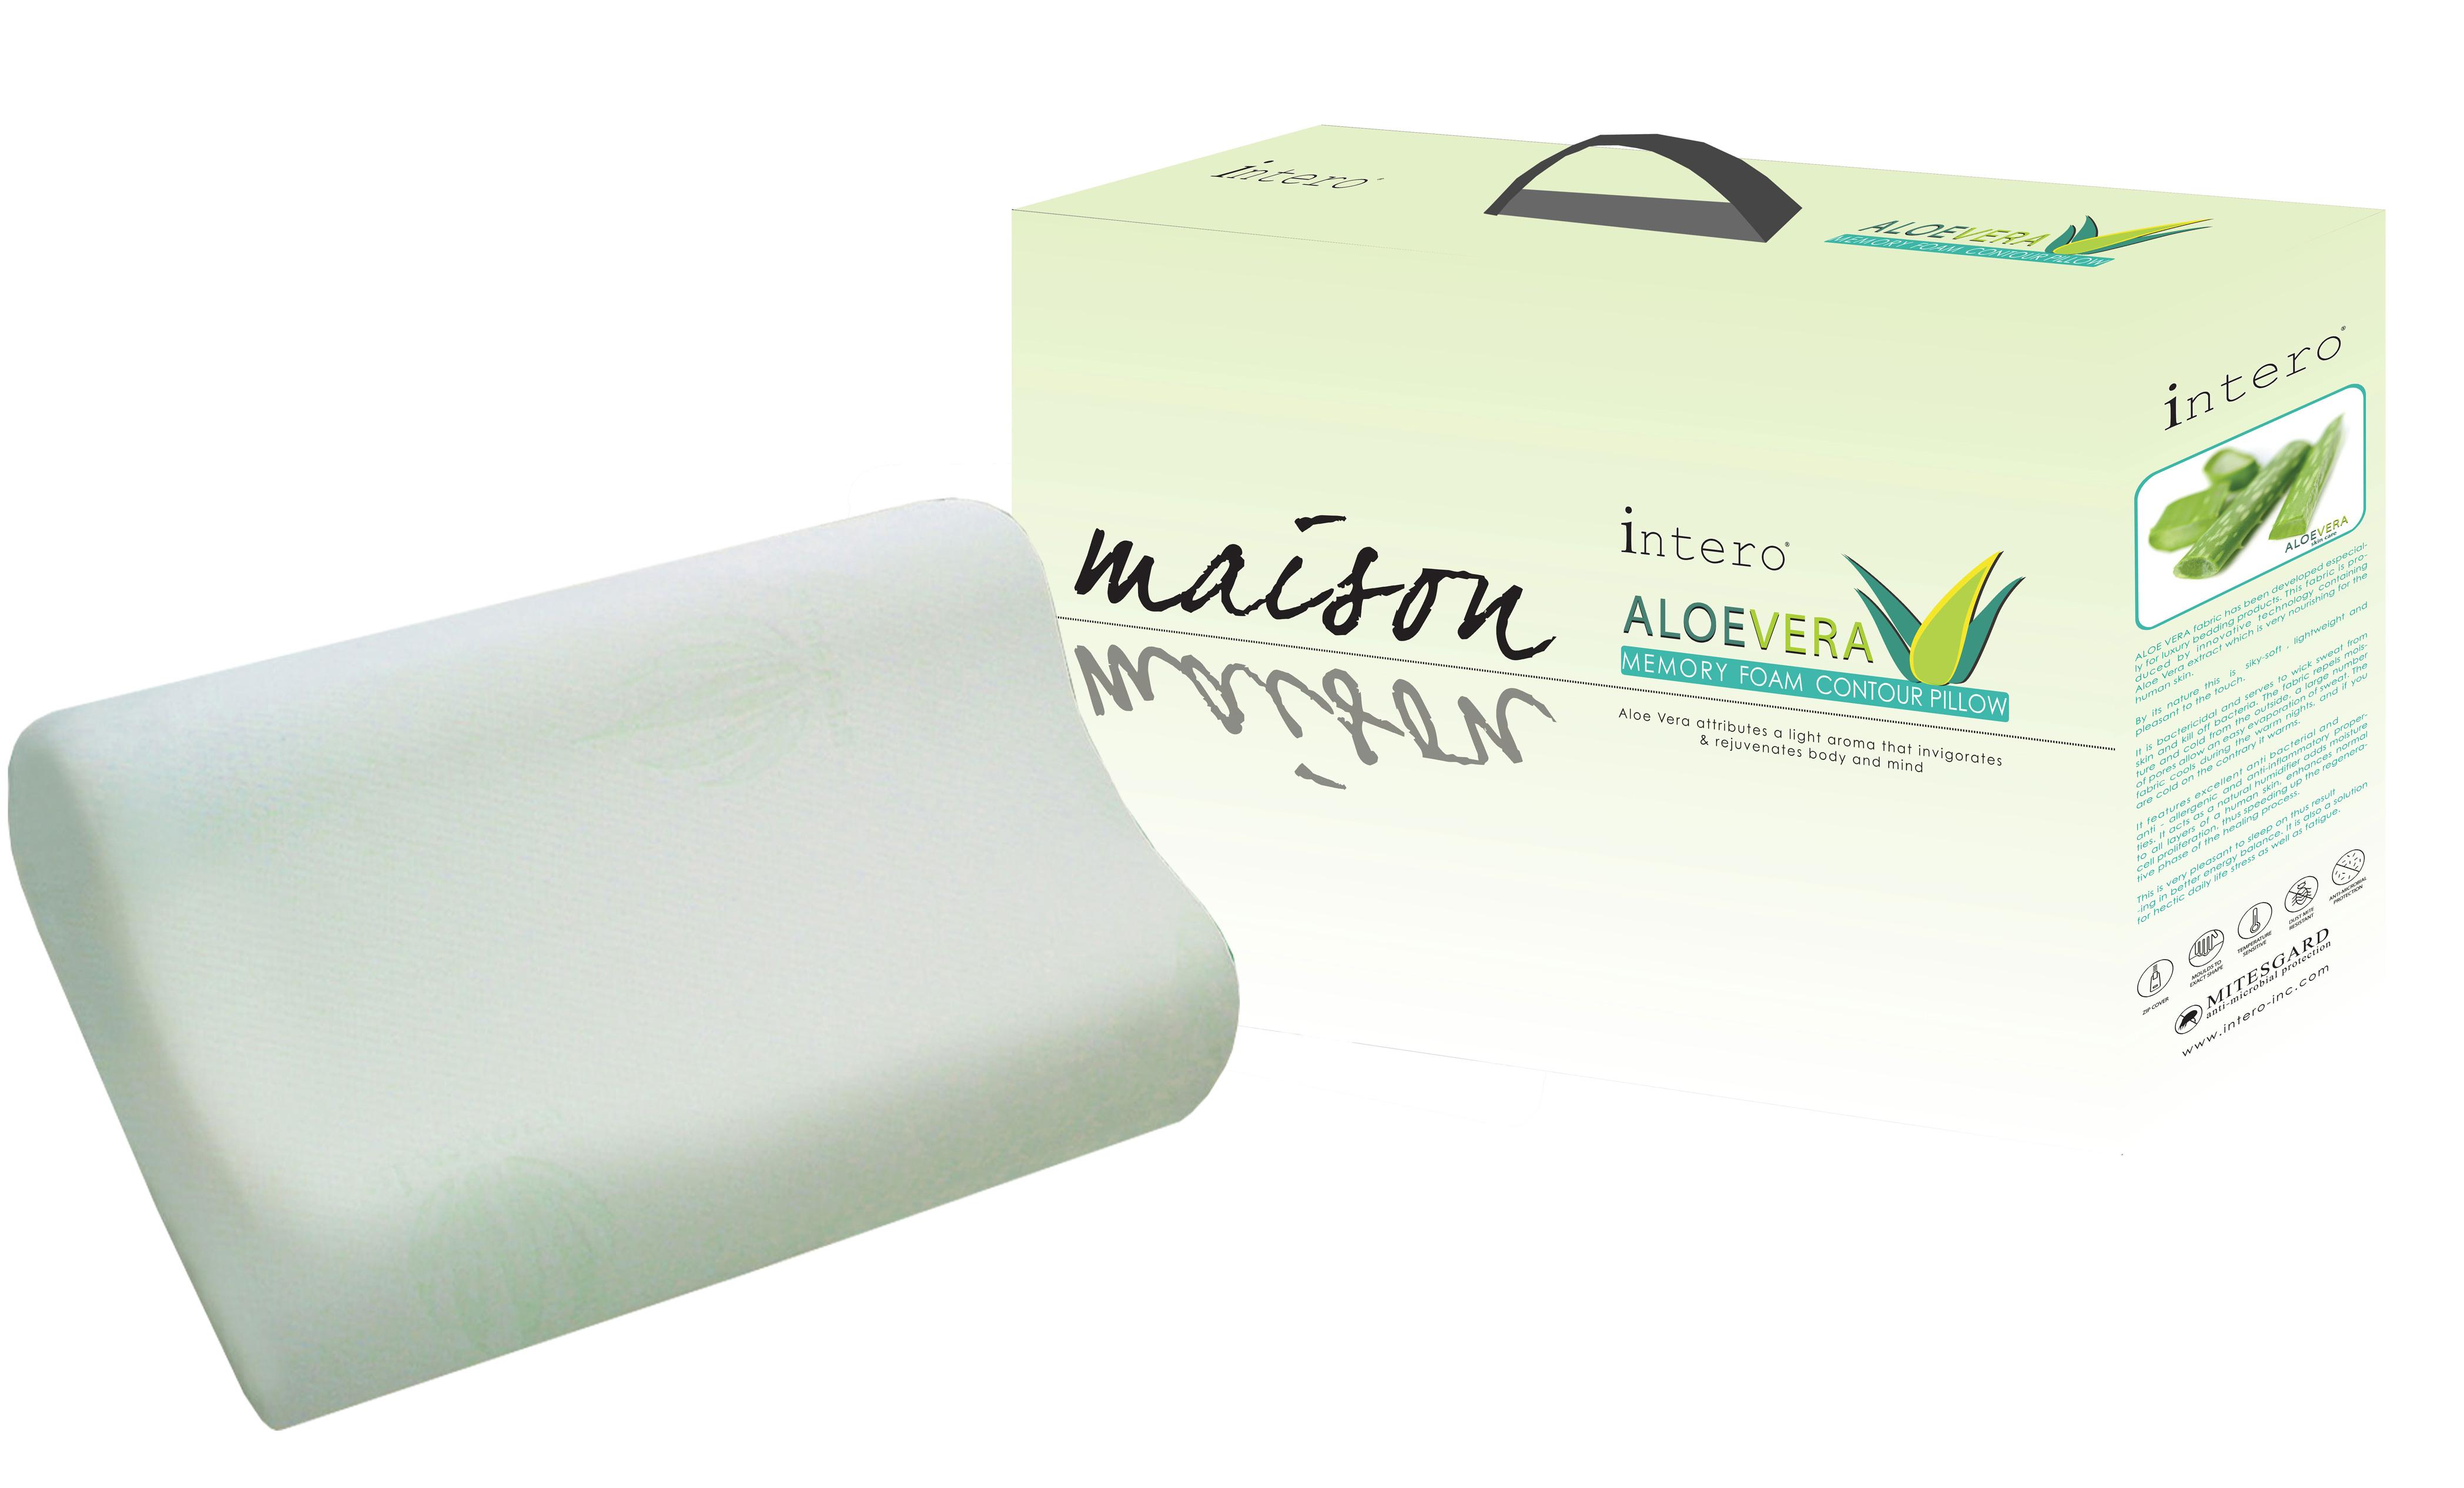 487-Intero-Maison-Aloe-Vera-Memory-Foam-Contour-Pillow-